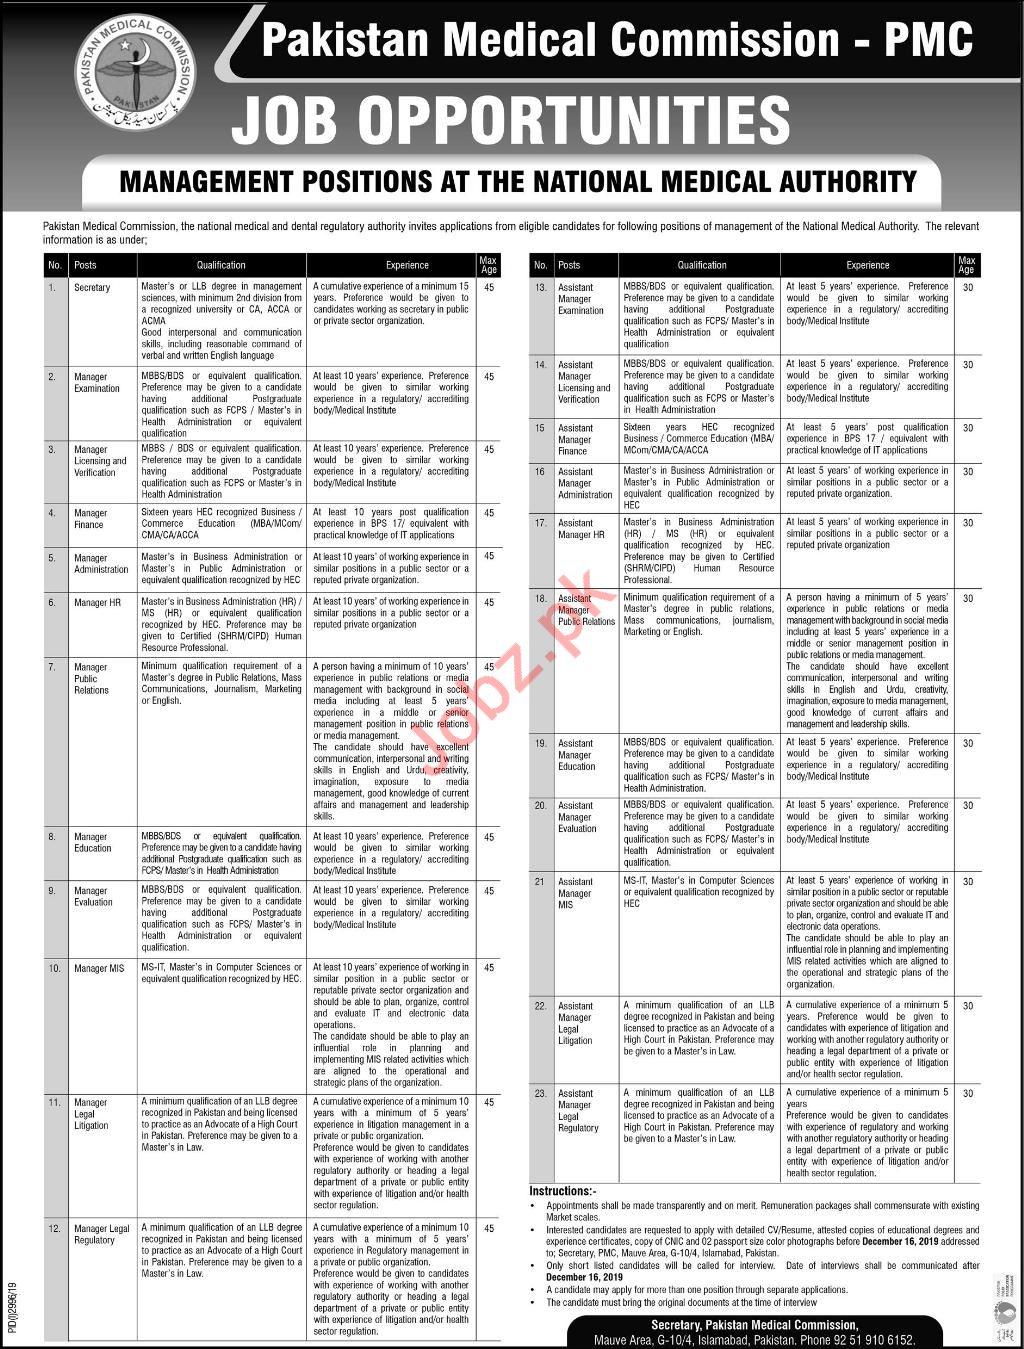 Pakistan Medical Commission PMC Jobs 2019